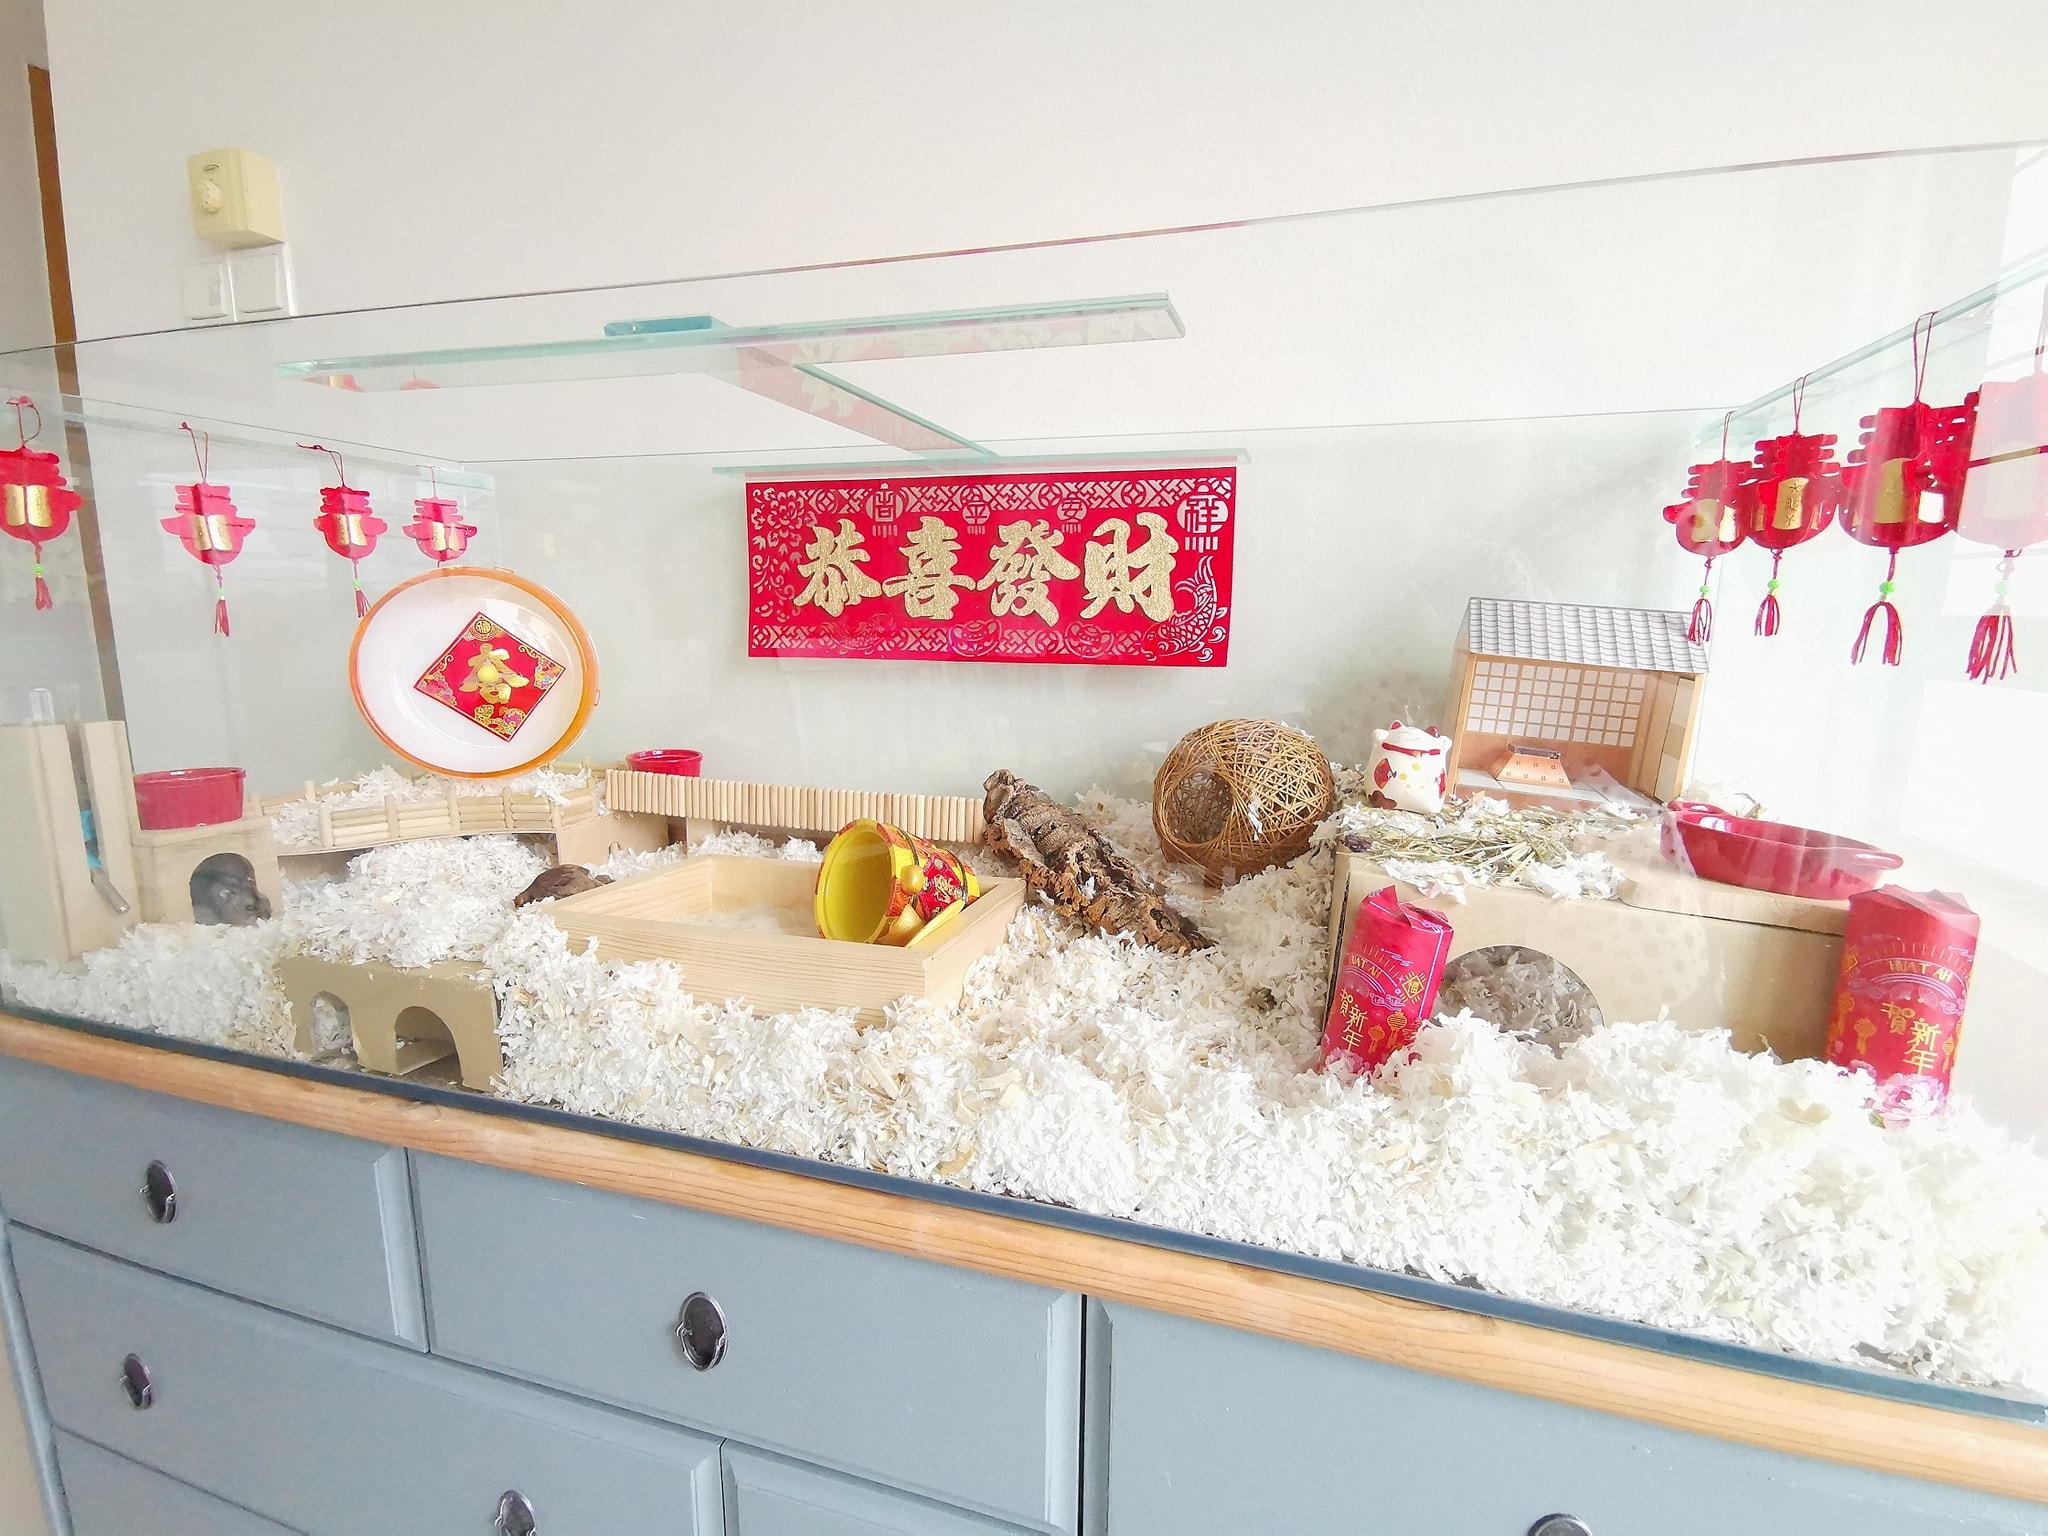 Erica's CNY hamster cage setup